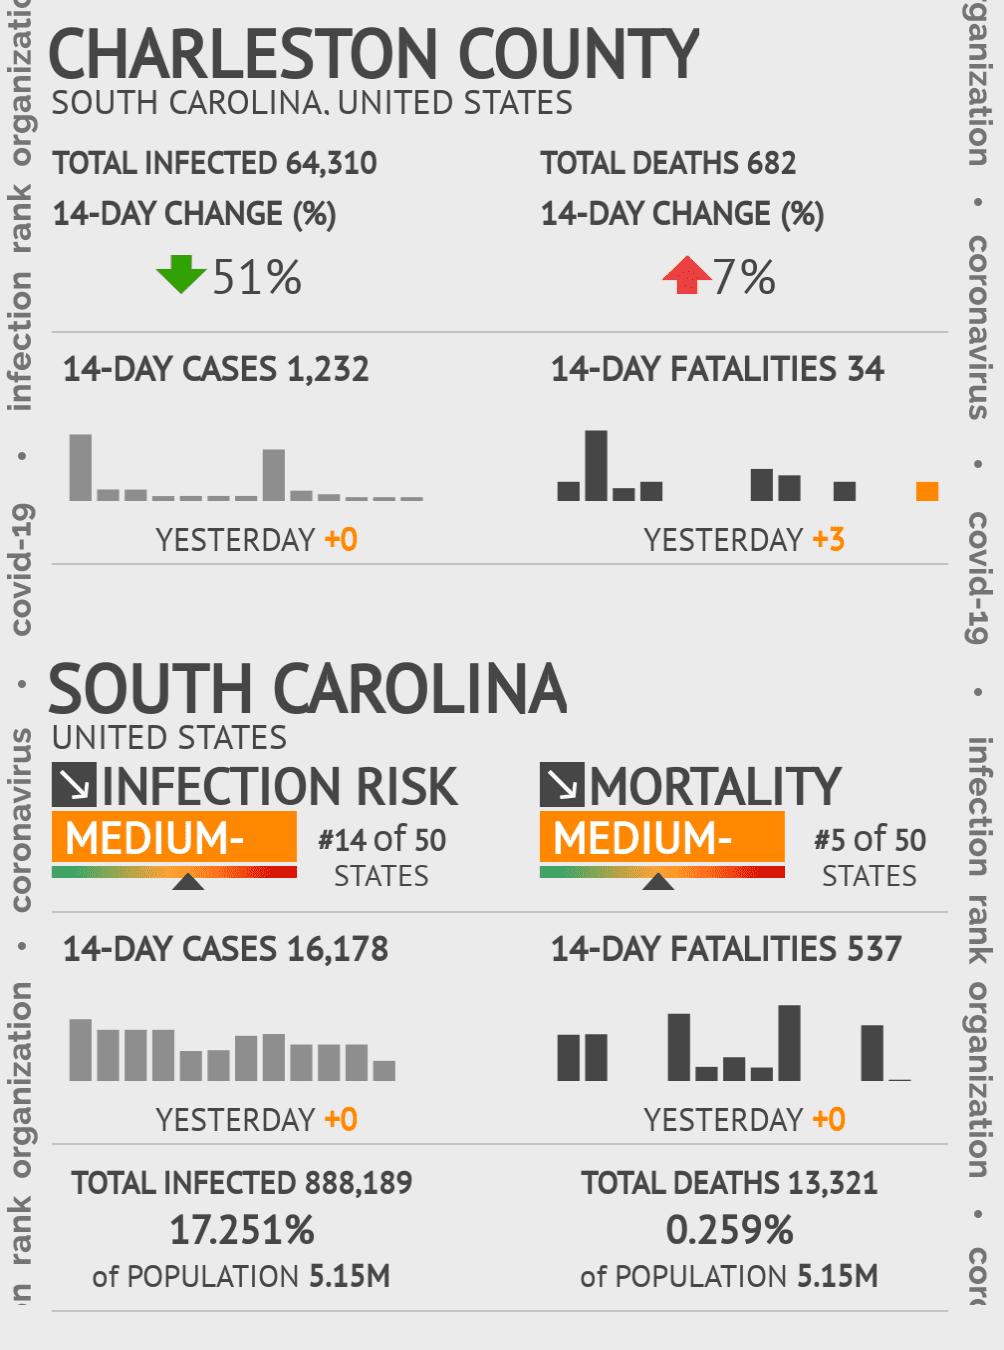 Charleston County Coronavirus Covid-19 Risk of Infection on March 04, 2021